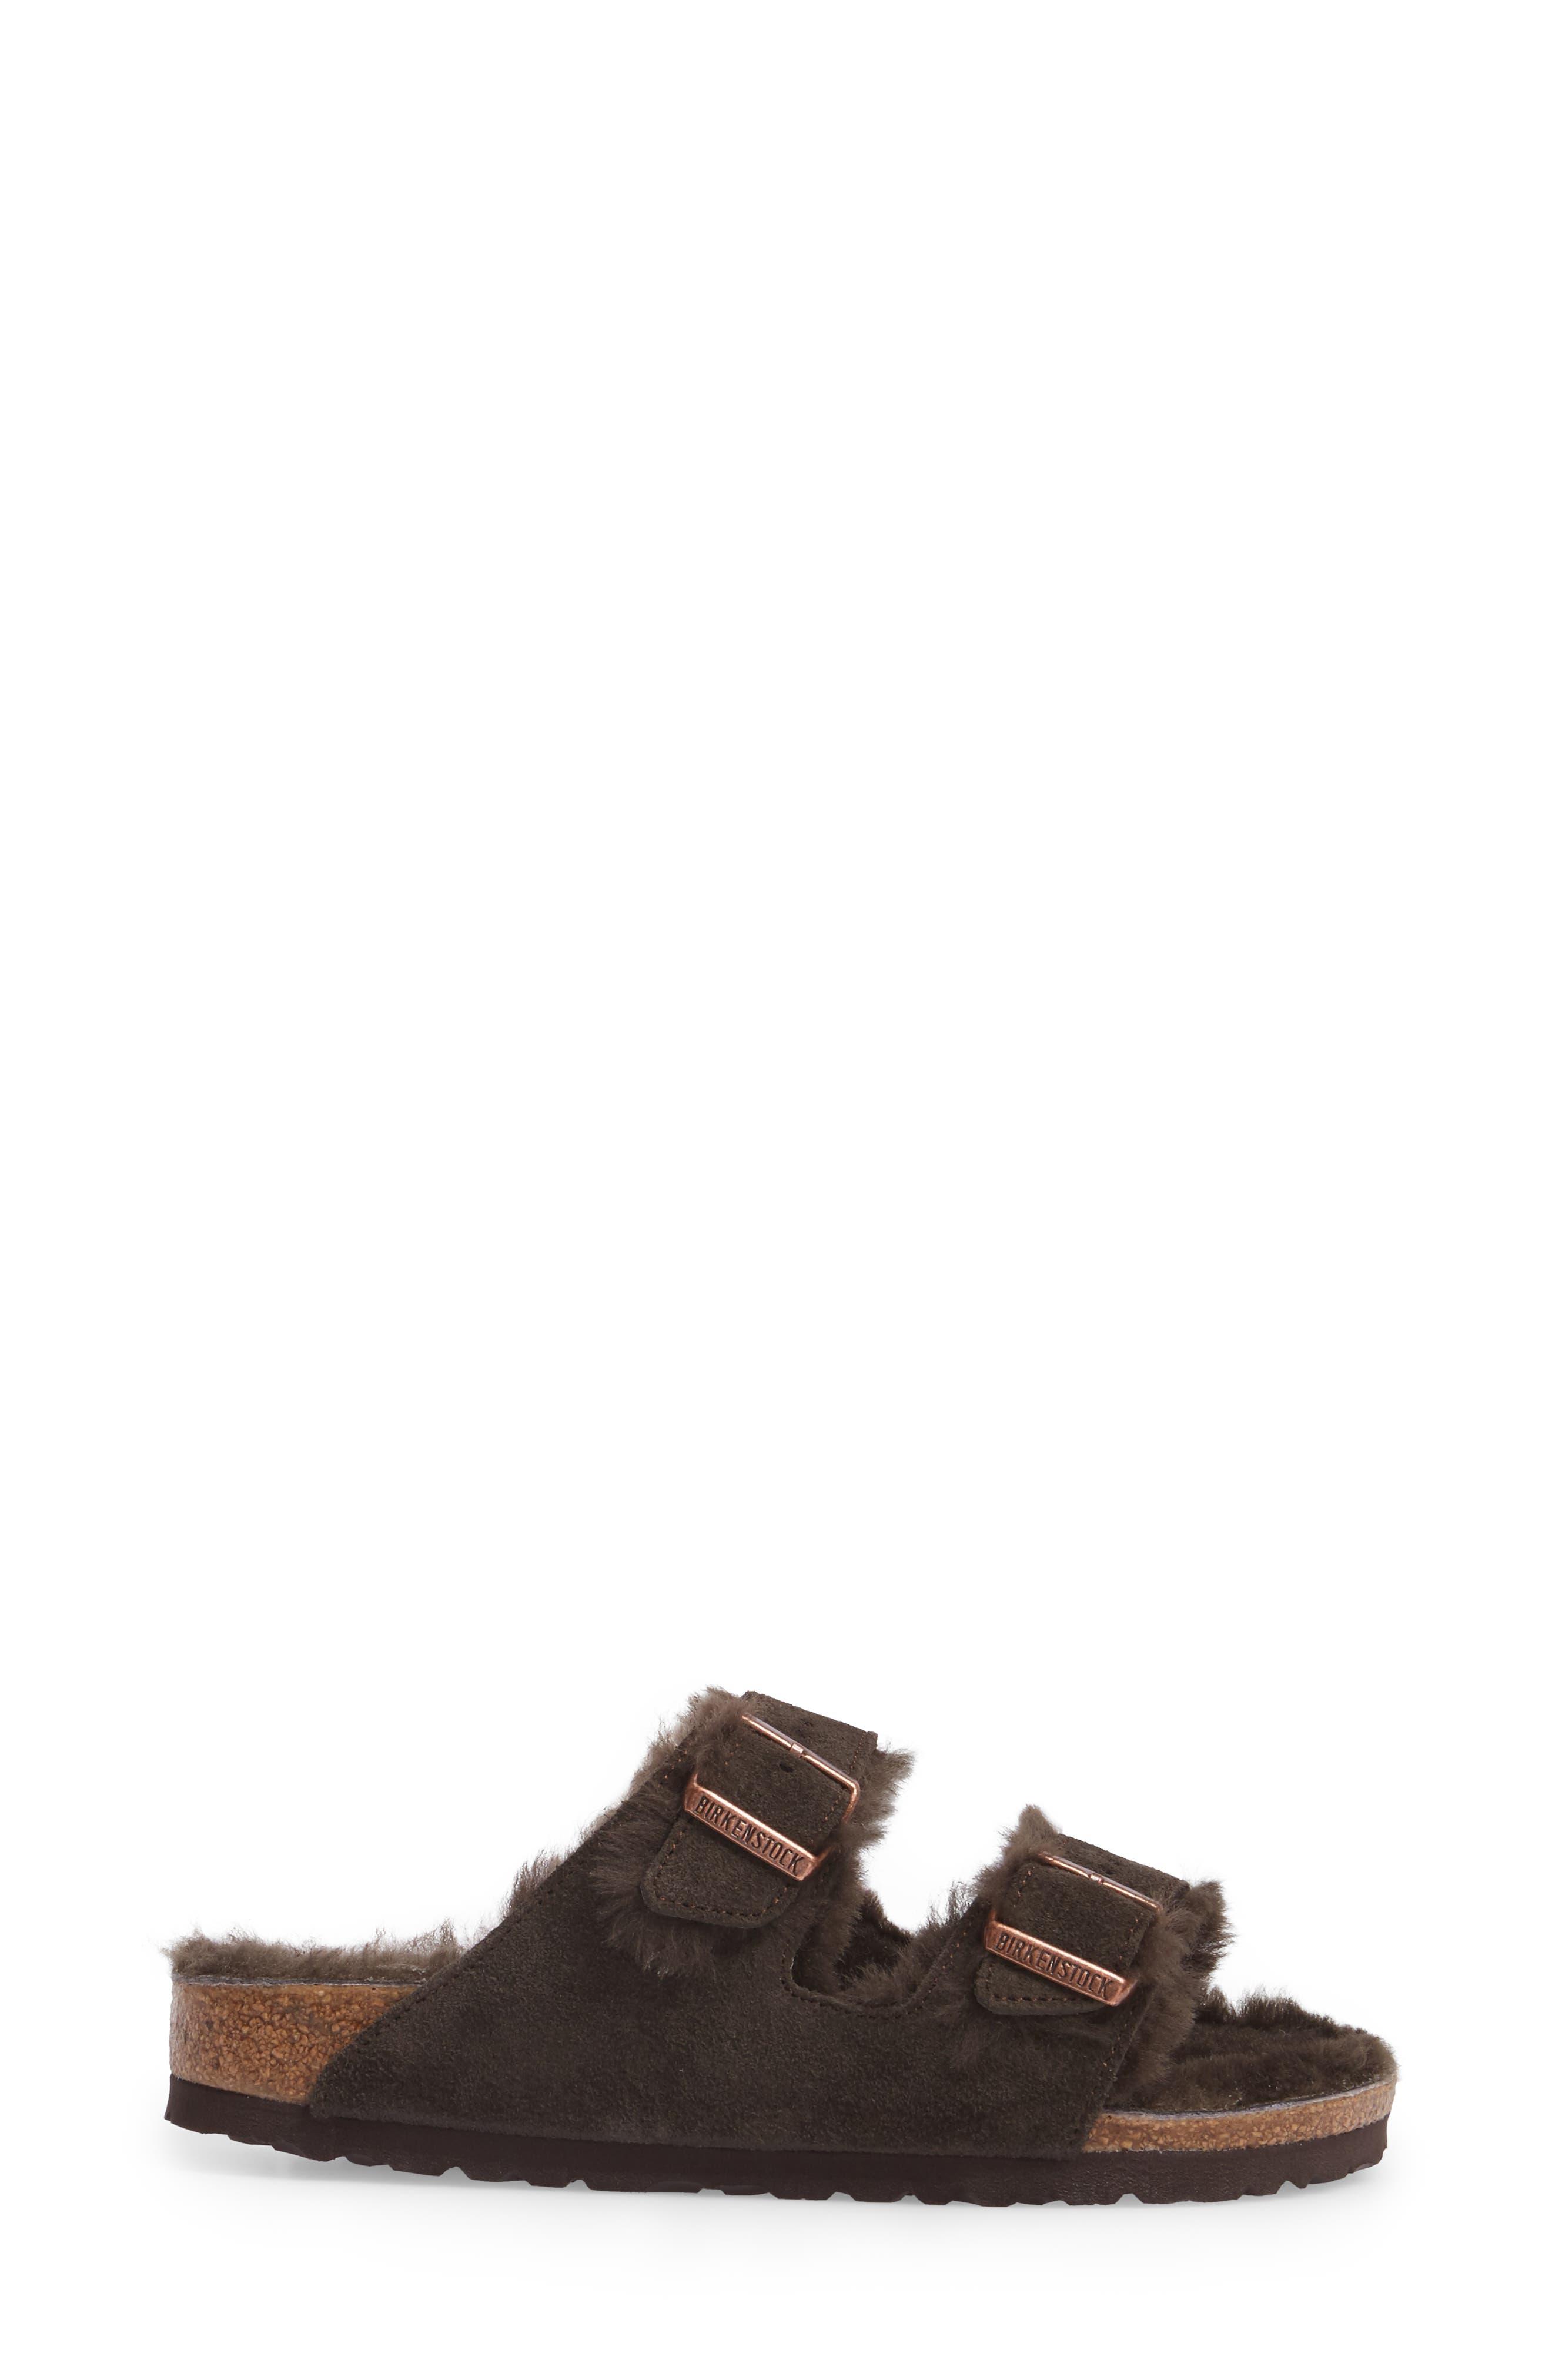 Arizona Genuine Shearling Lined Sandal,                             Alternate thumbnail 3, color,                             200